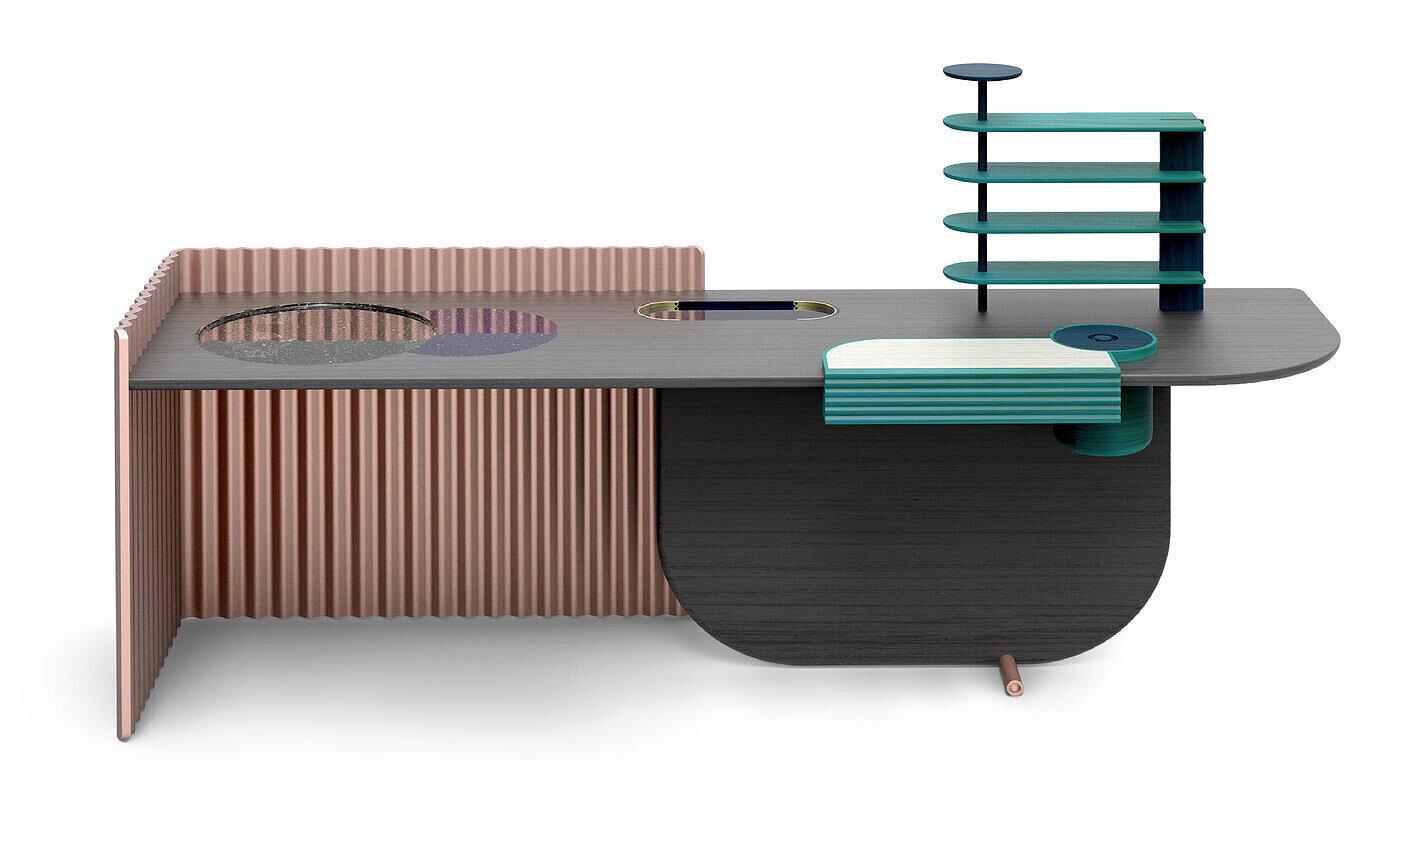 Erde%252B%252526%252BHimmel_Concept_Furnitures_Kitchen.jpg